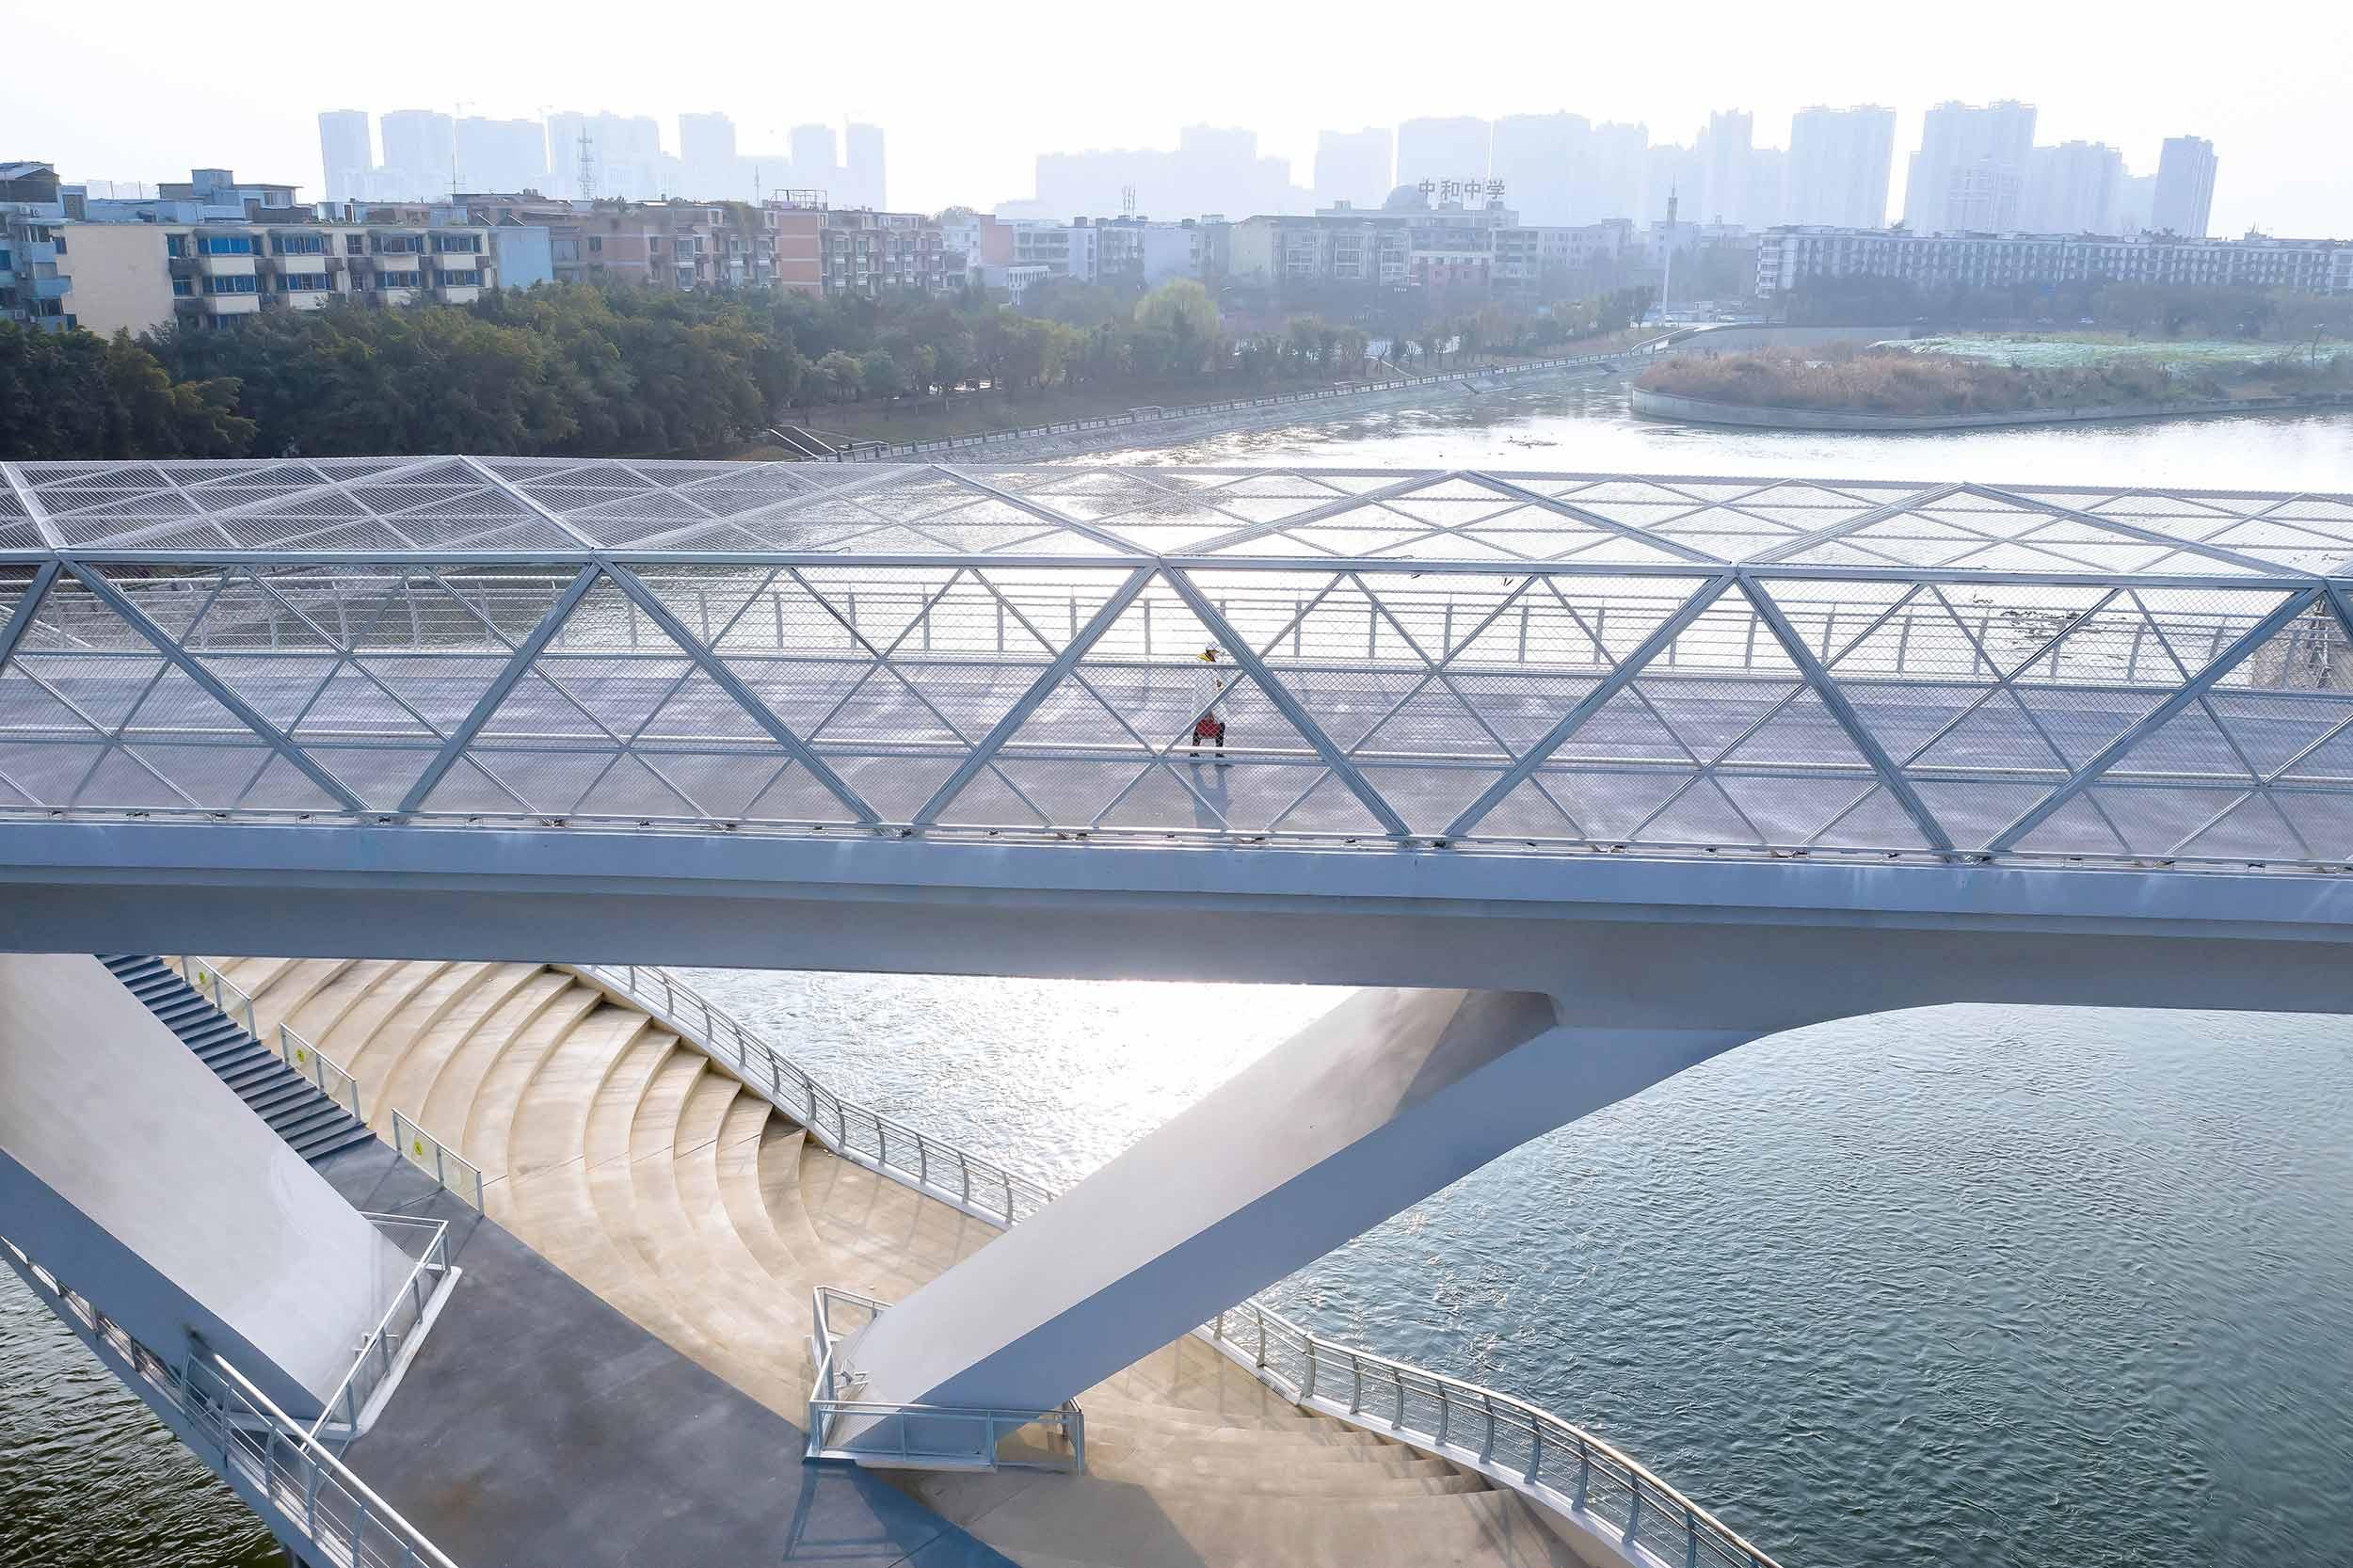 Daylight Detail Shot 五岔子大橋 - Wuchazi Bridge (INFINITE LOOP)